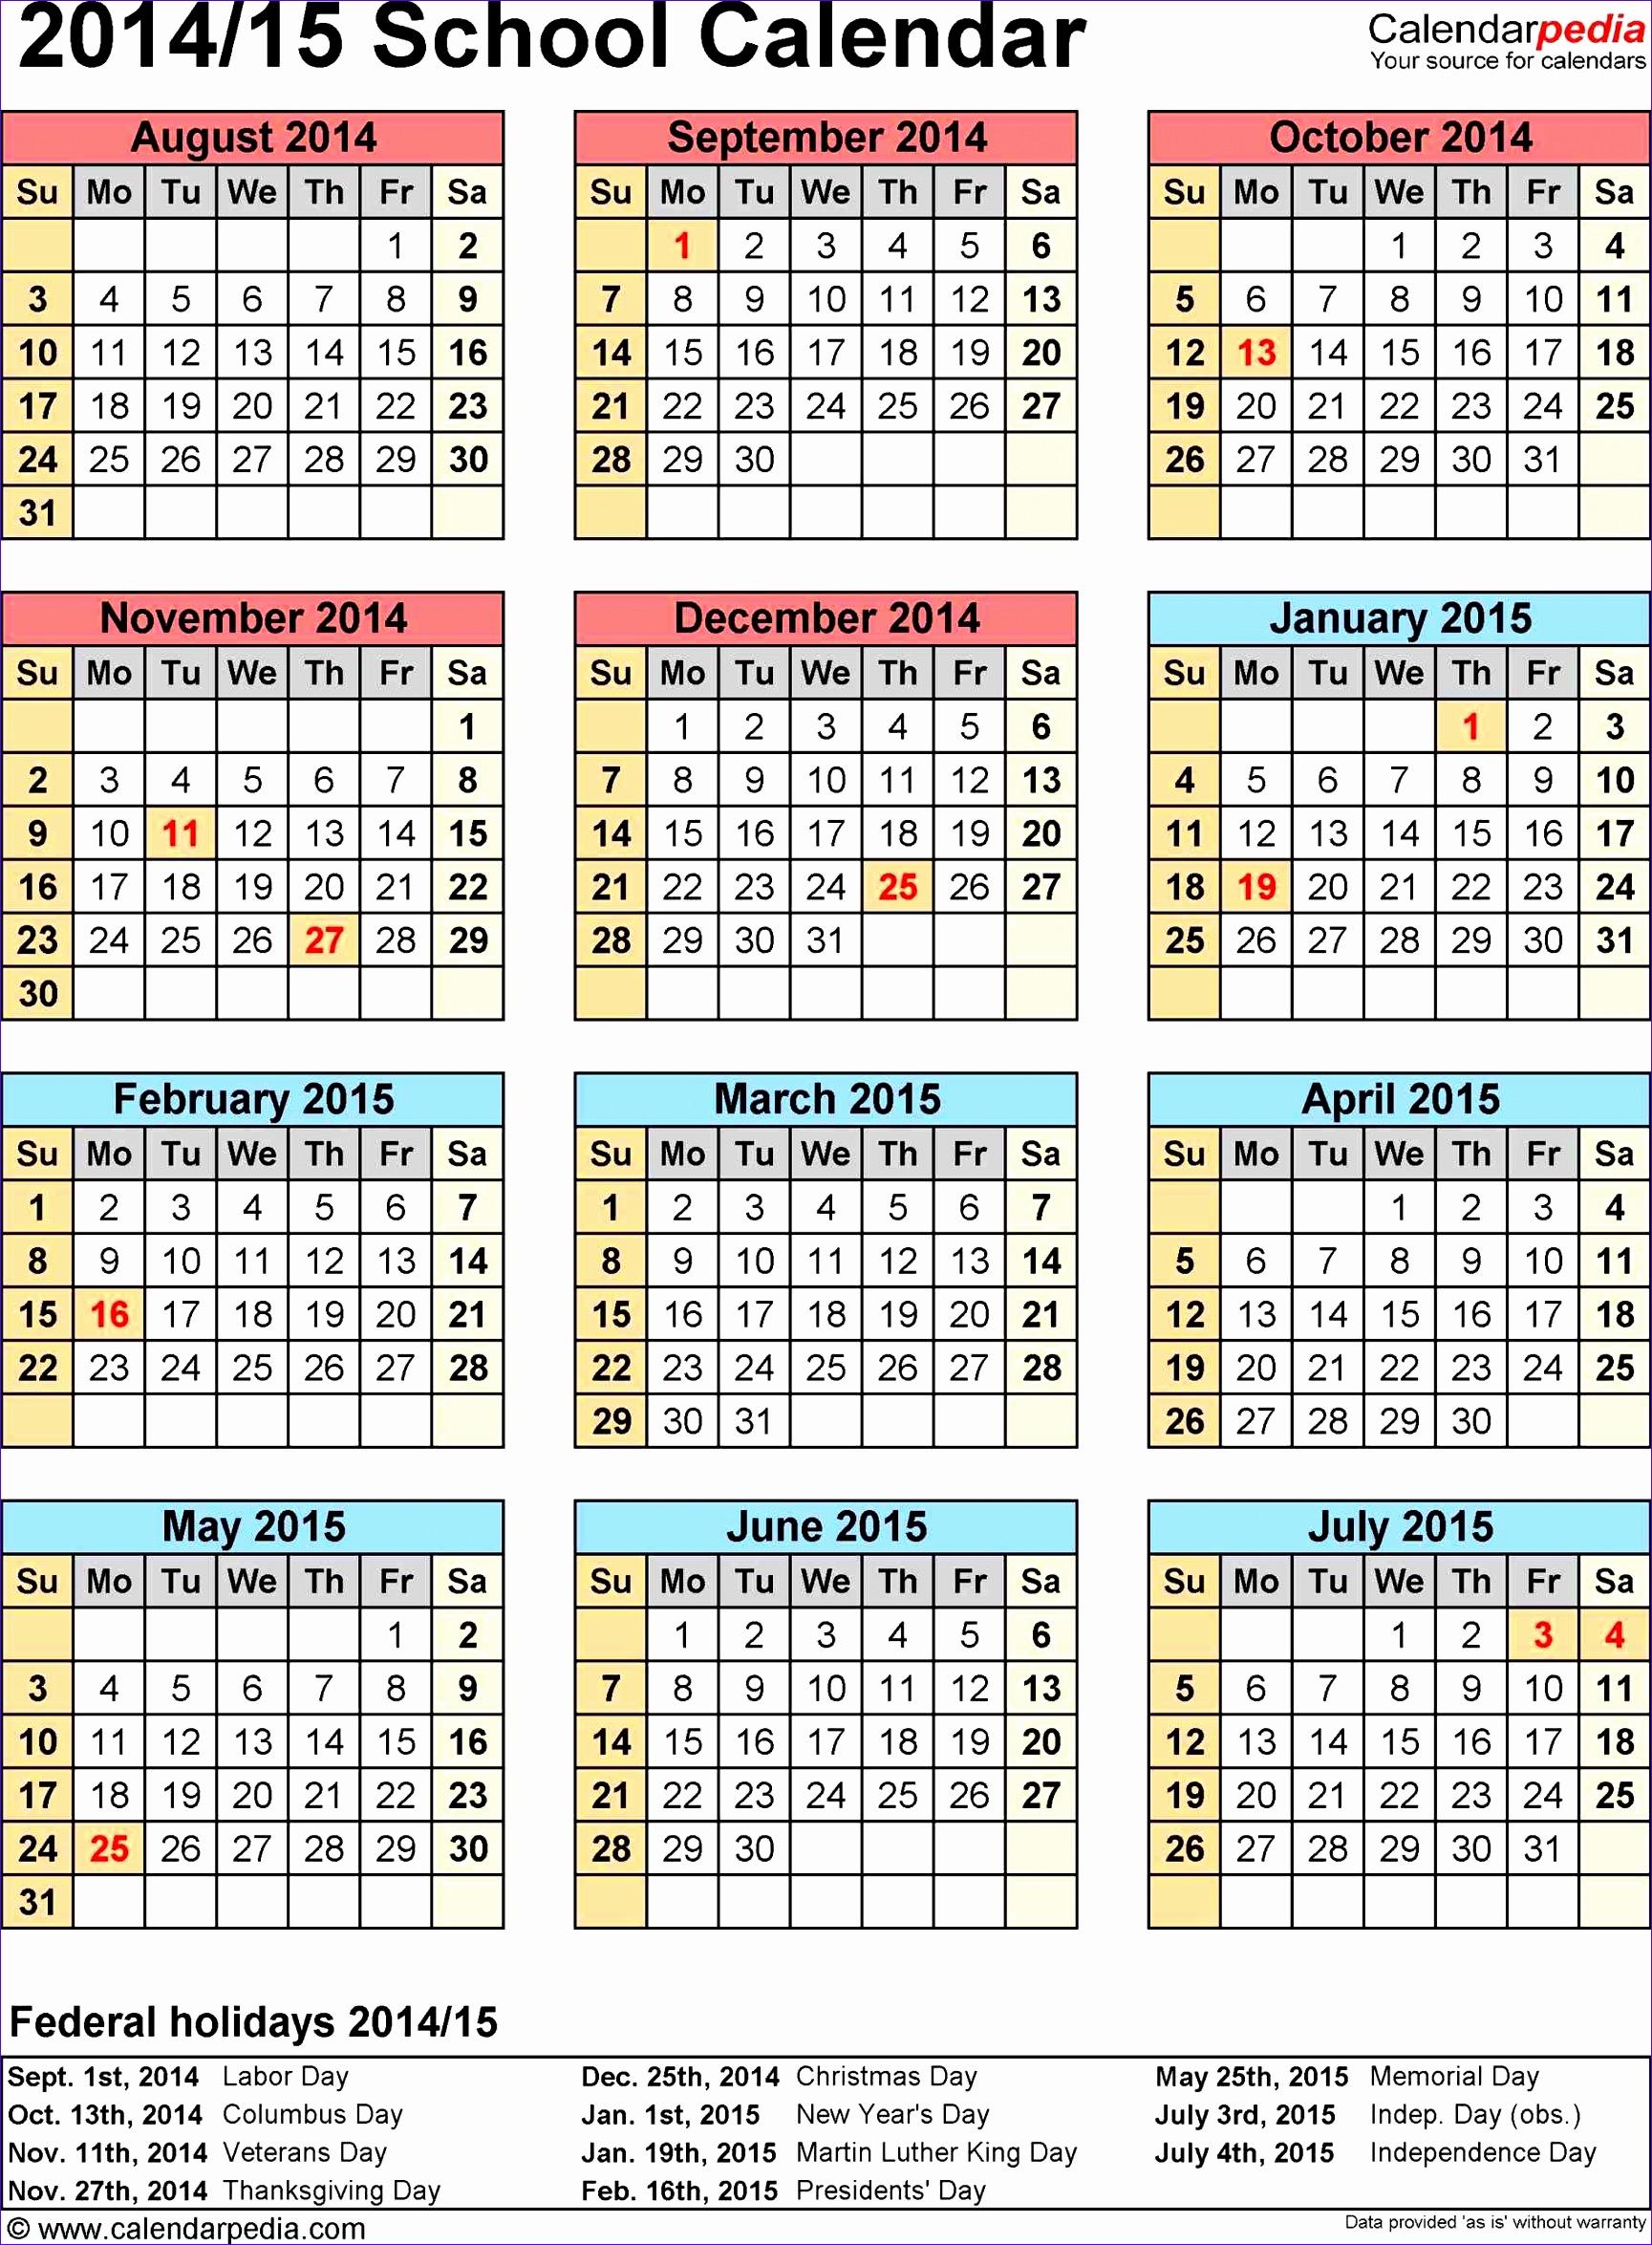 year calendar printable excel templates monthly dalarcon monthly Ms Excel Calendar Template 2014 calendar templates dalarcon academic calendars as free printable excel academic Ms